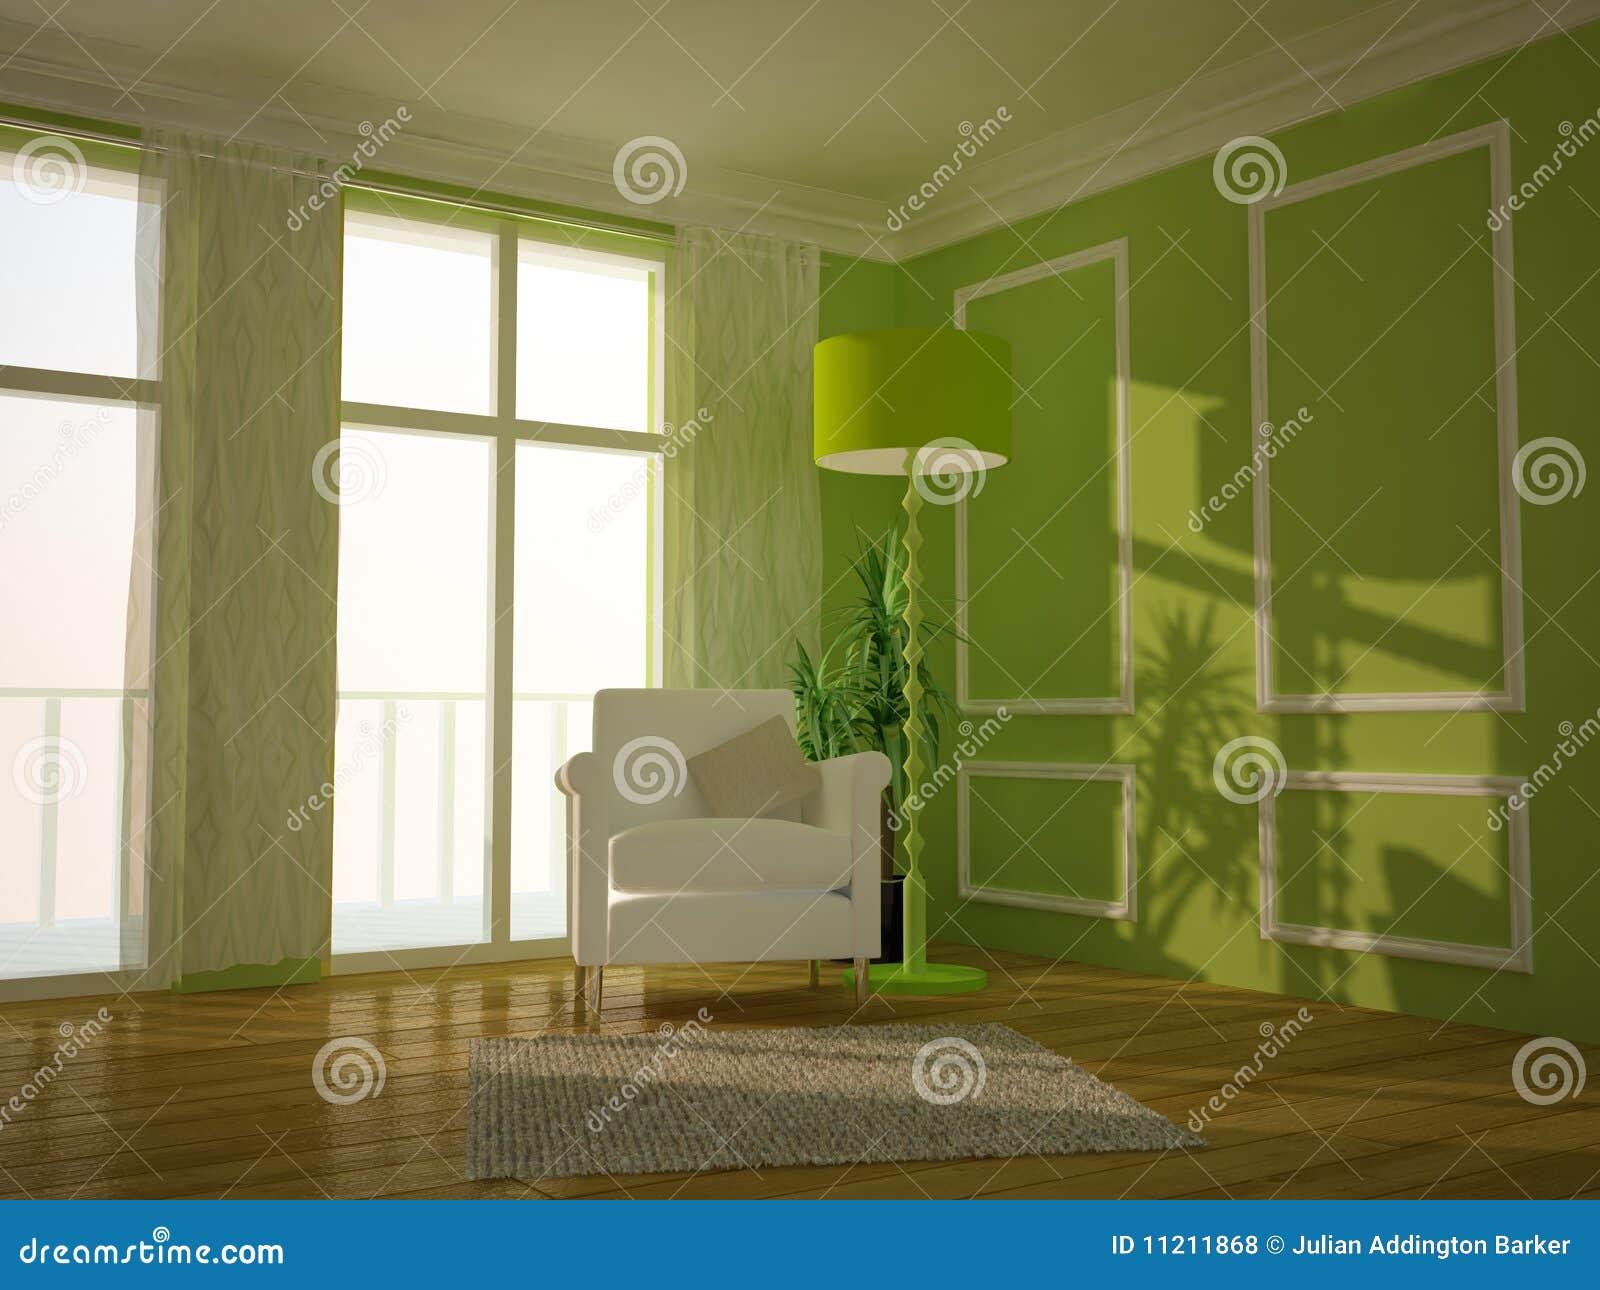 Sala De Estar Pintada De Verde ~ Quarto Tradicional Verde Da Sala De Estar Fotos de Stock Royalty Free